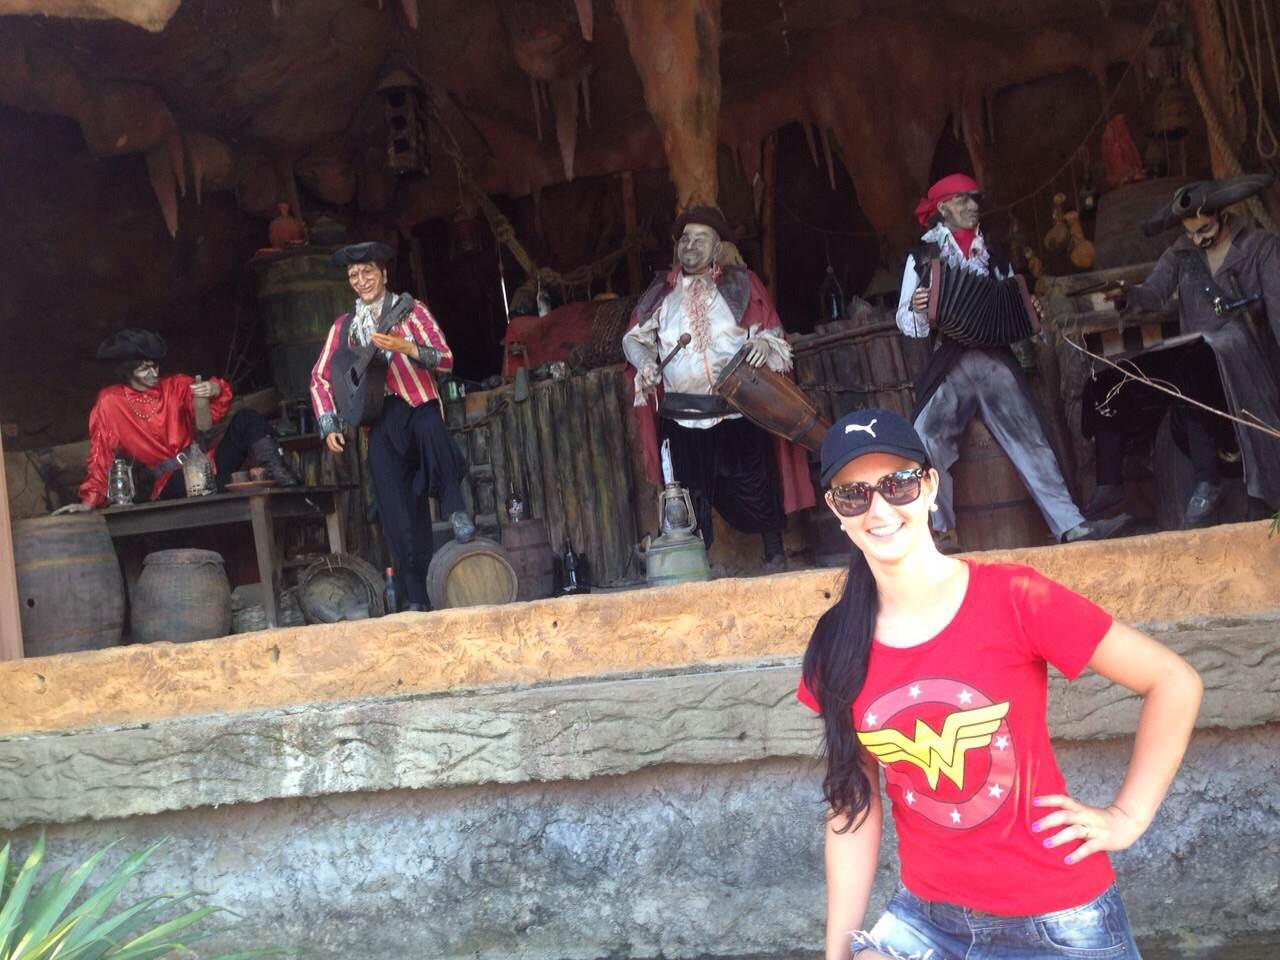 Beto Carrero Ilha dos Piratas